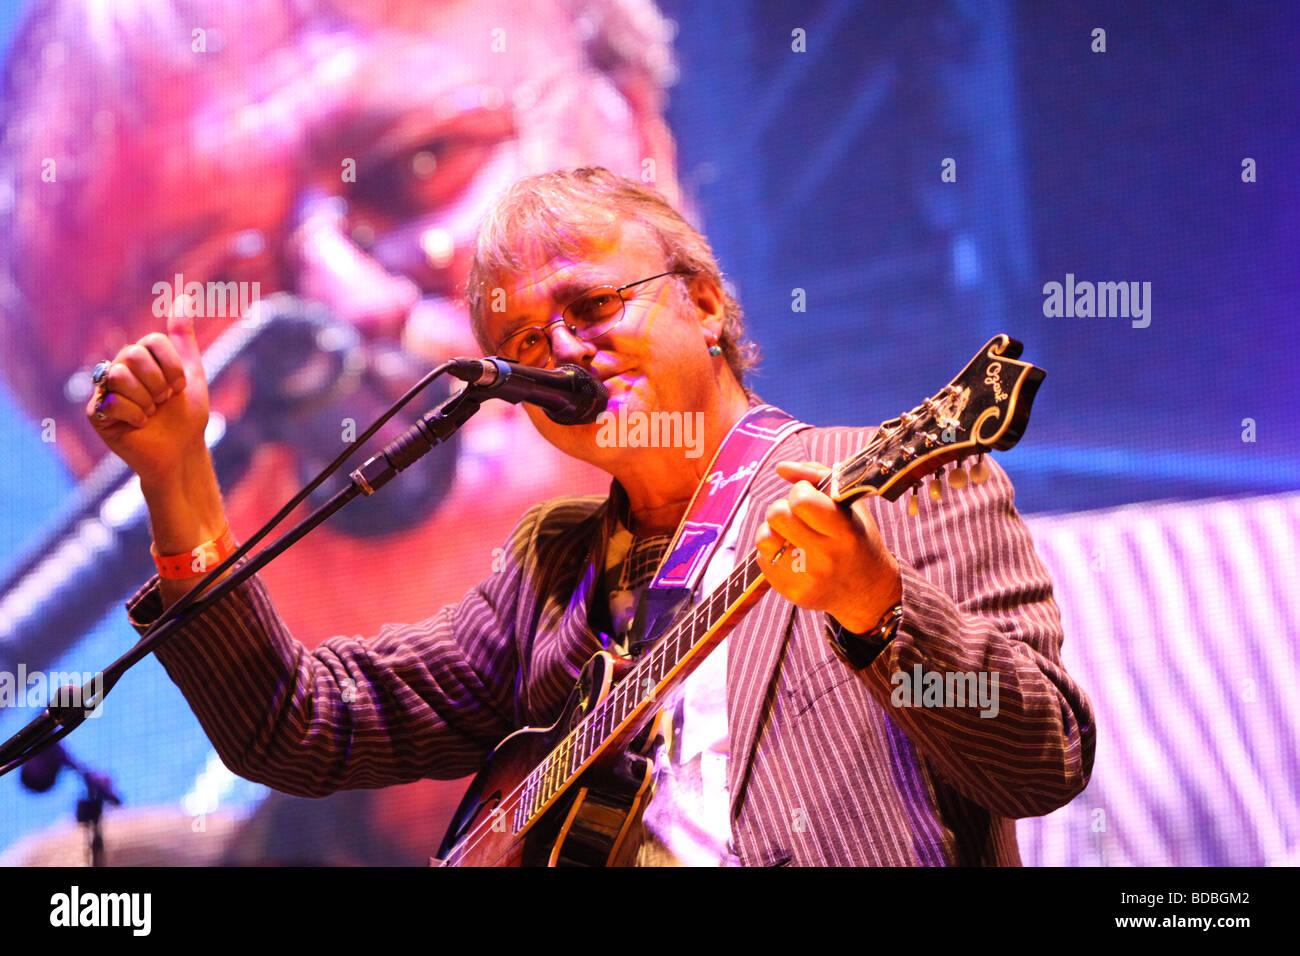 Chris Leslie at Cropredy 2009 - Stock Image